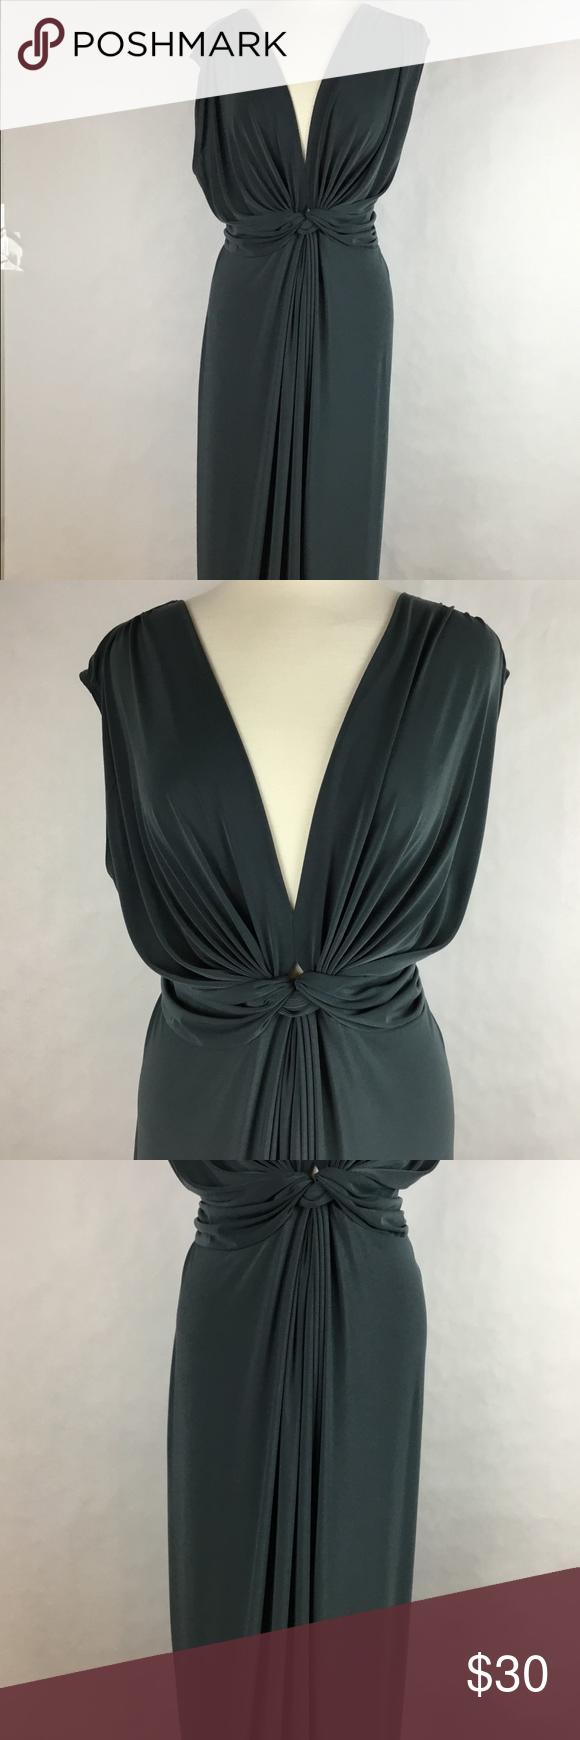 Women maxi dress deep vneck tied back size x maxi dresses and